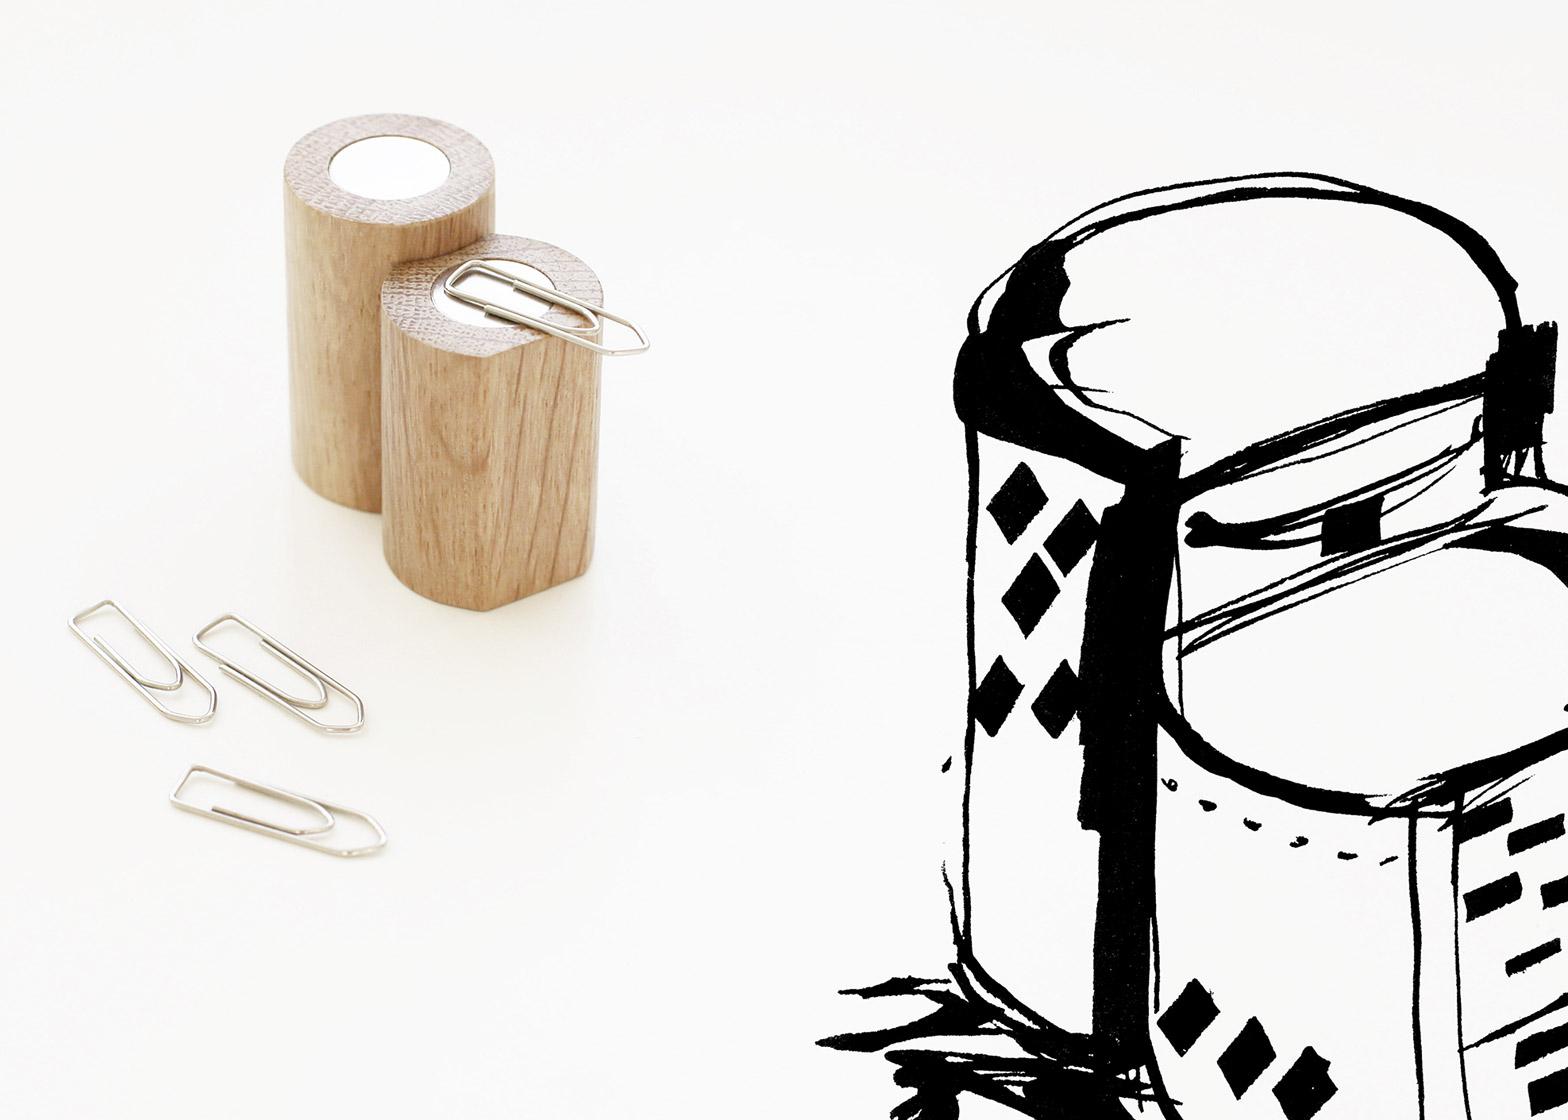 Image: The paper-clip holder references Melnikov House by K.S. Melnikov. Courtesy of Dezeen